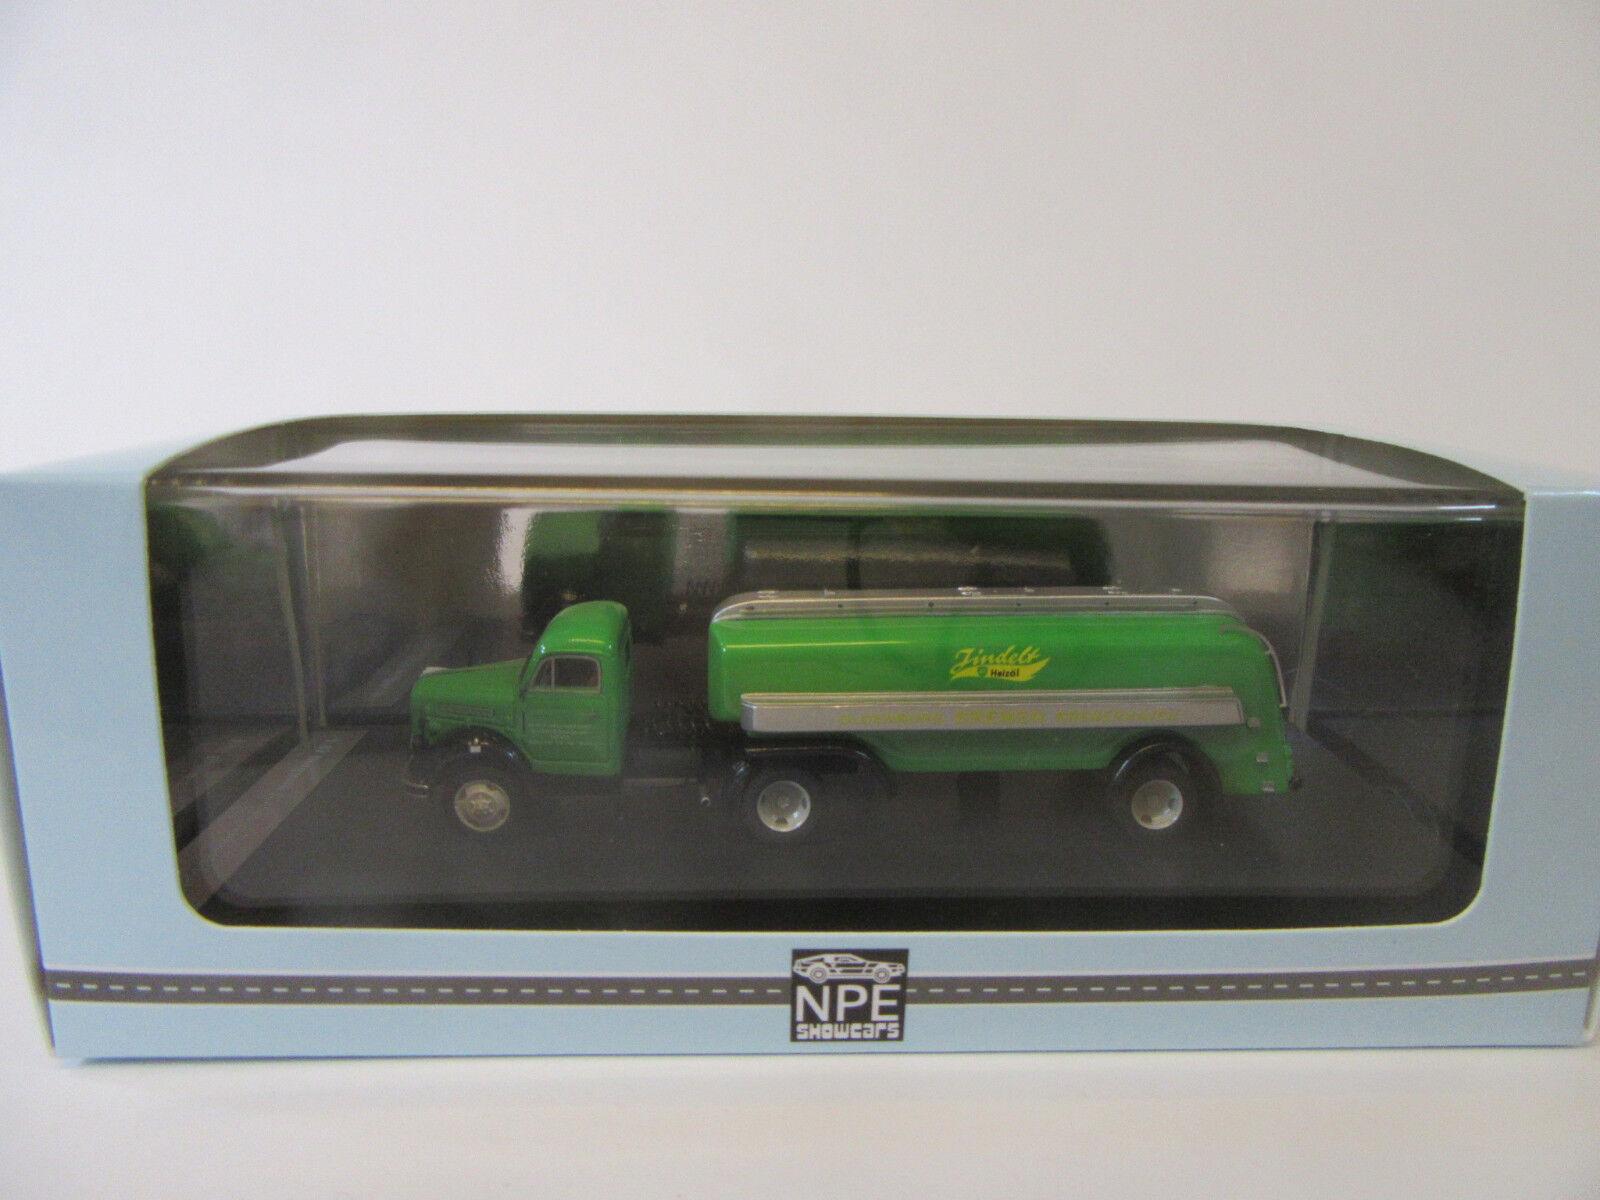 Npe Borgard Tank Truck Bp 99075 1 87 Finshed Model